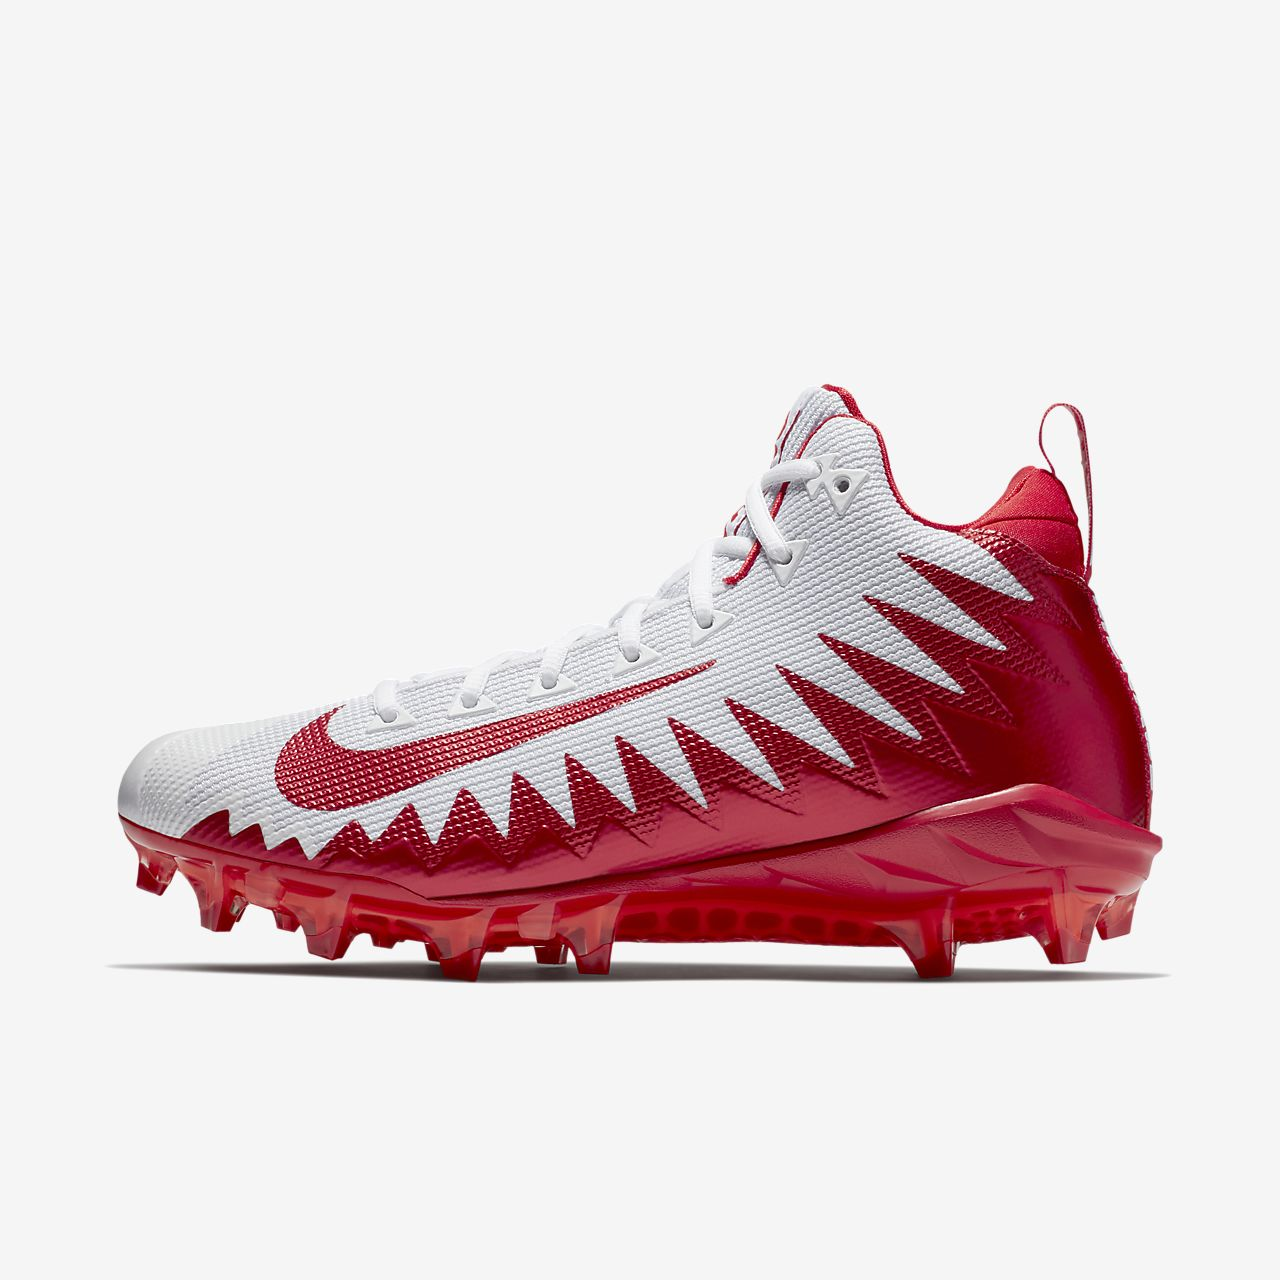 07dda4089dfb Nike Alpha Menace Pro Mid Men s Football Cleat. Nike.com